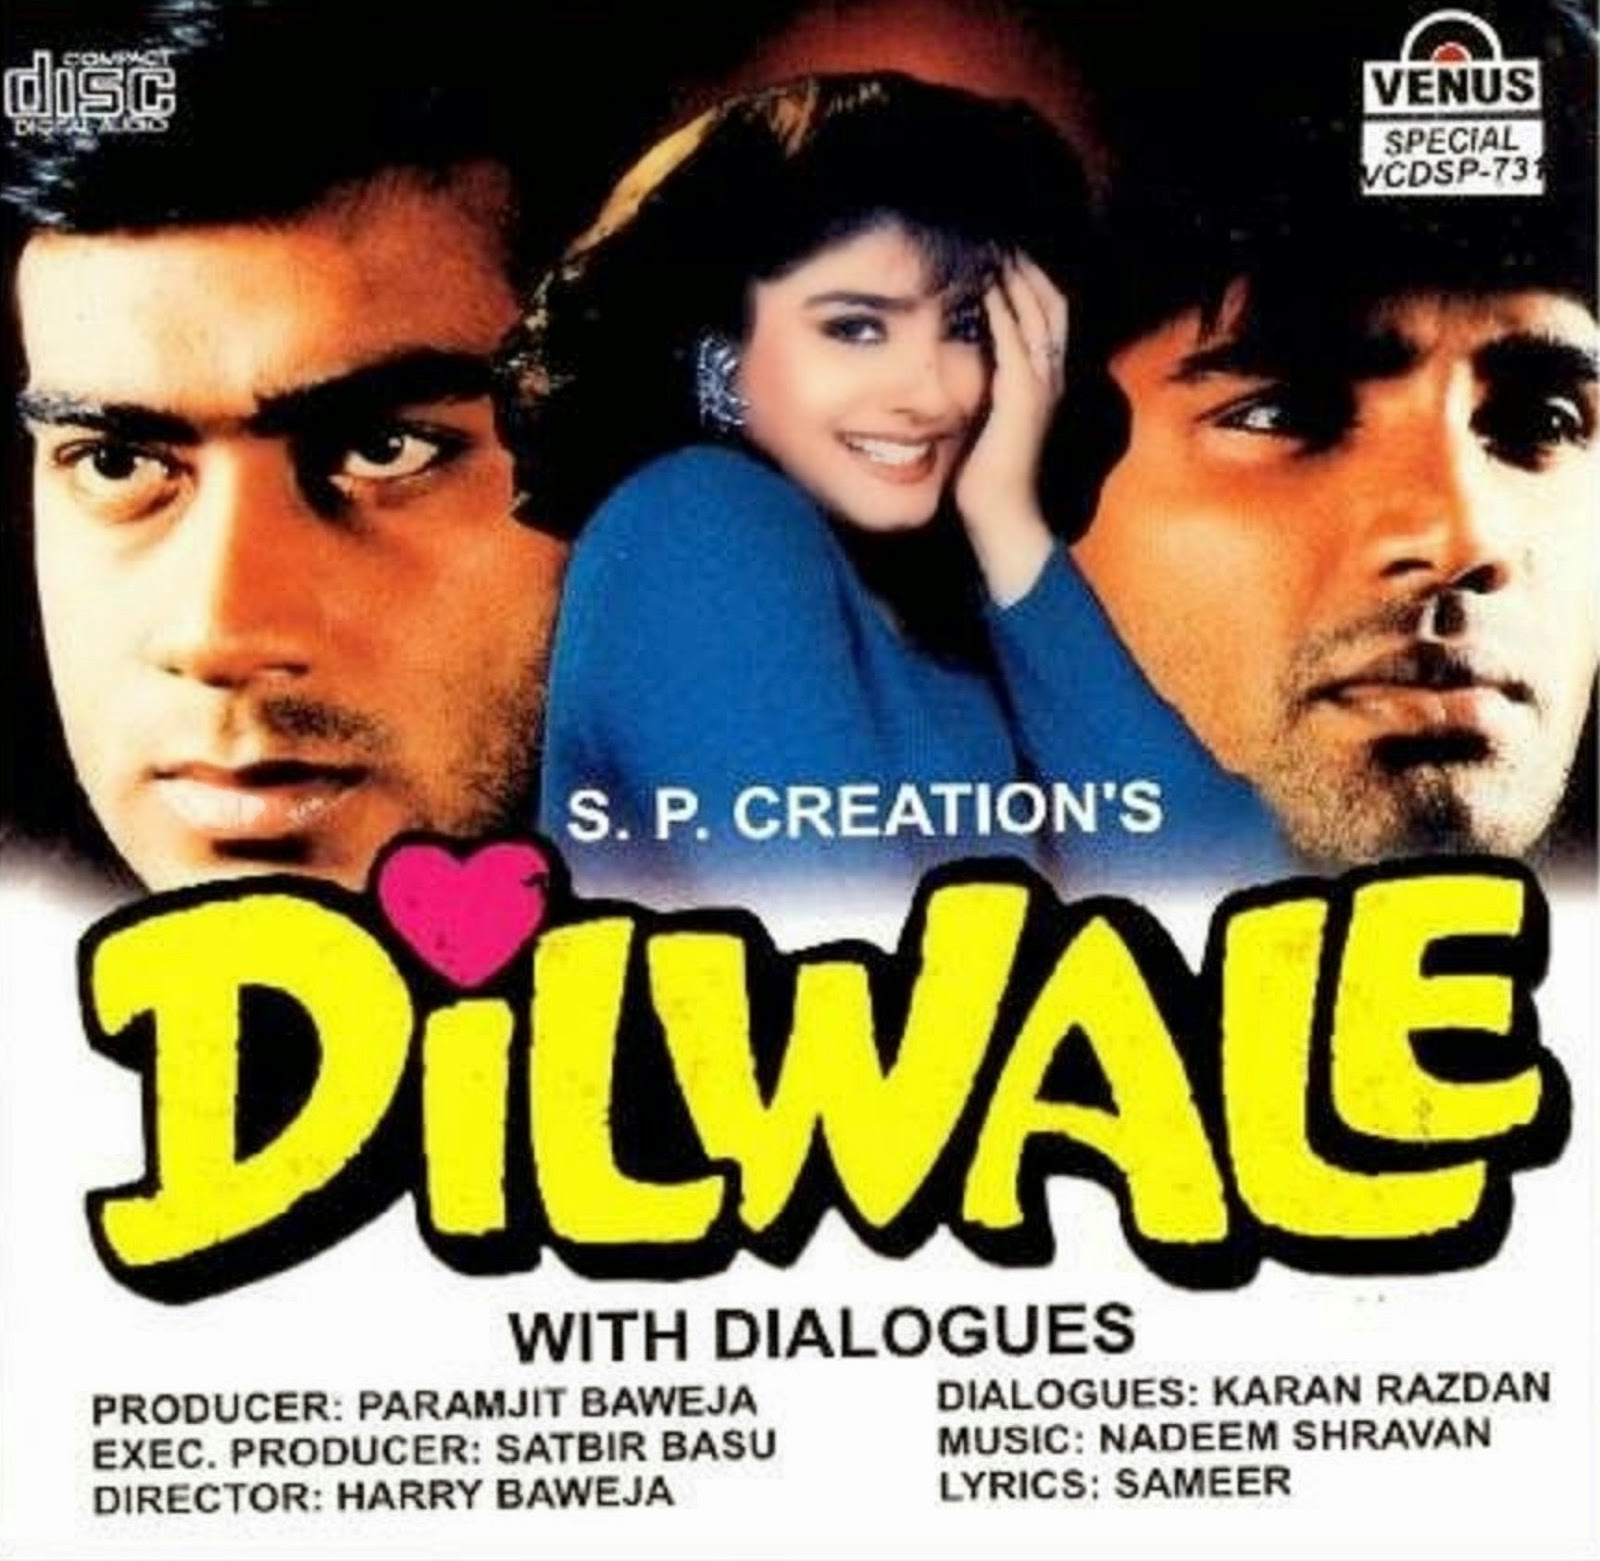 Dilwale film songs download 2015 pagalworld bibcam boys 13yo.